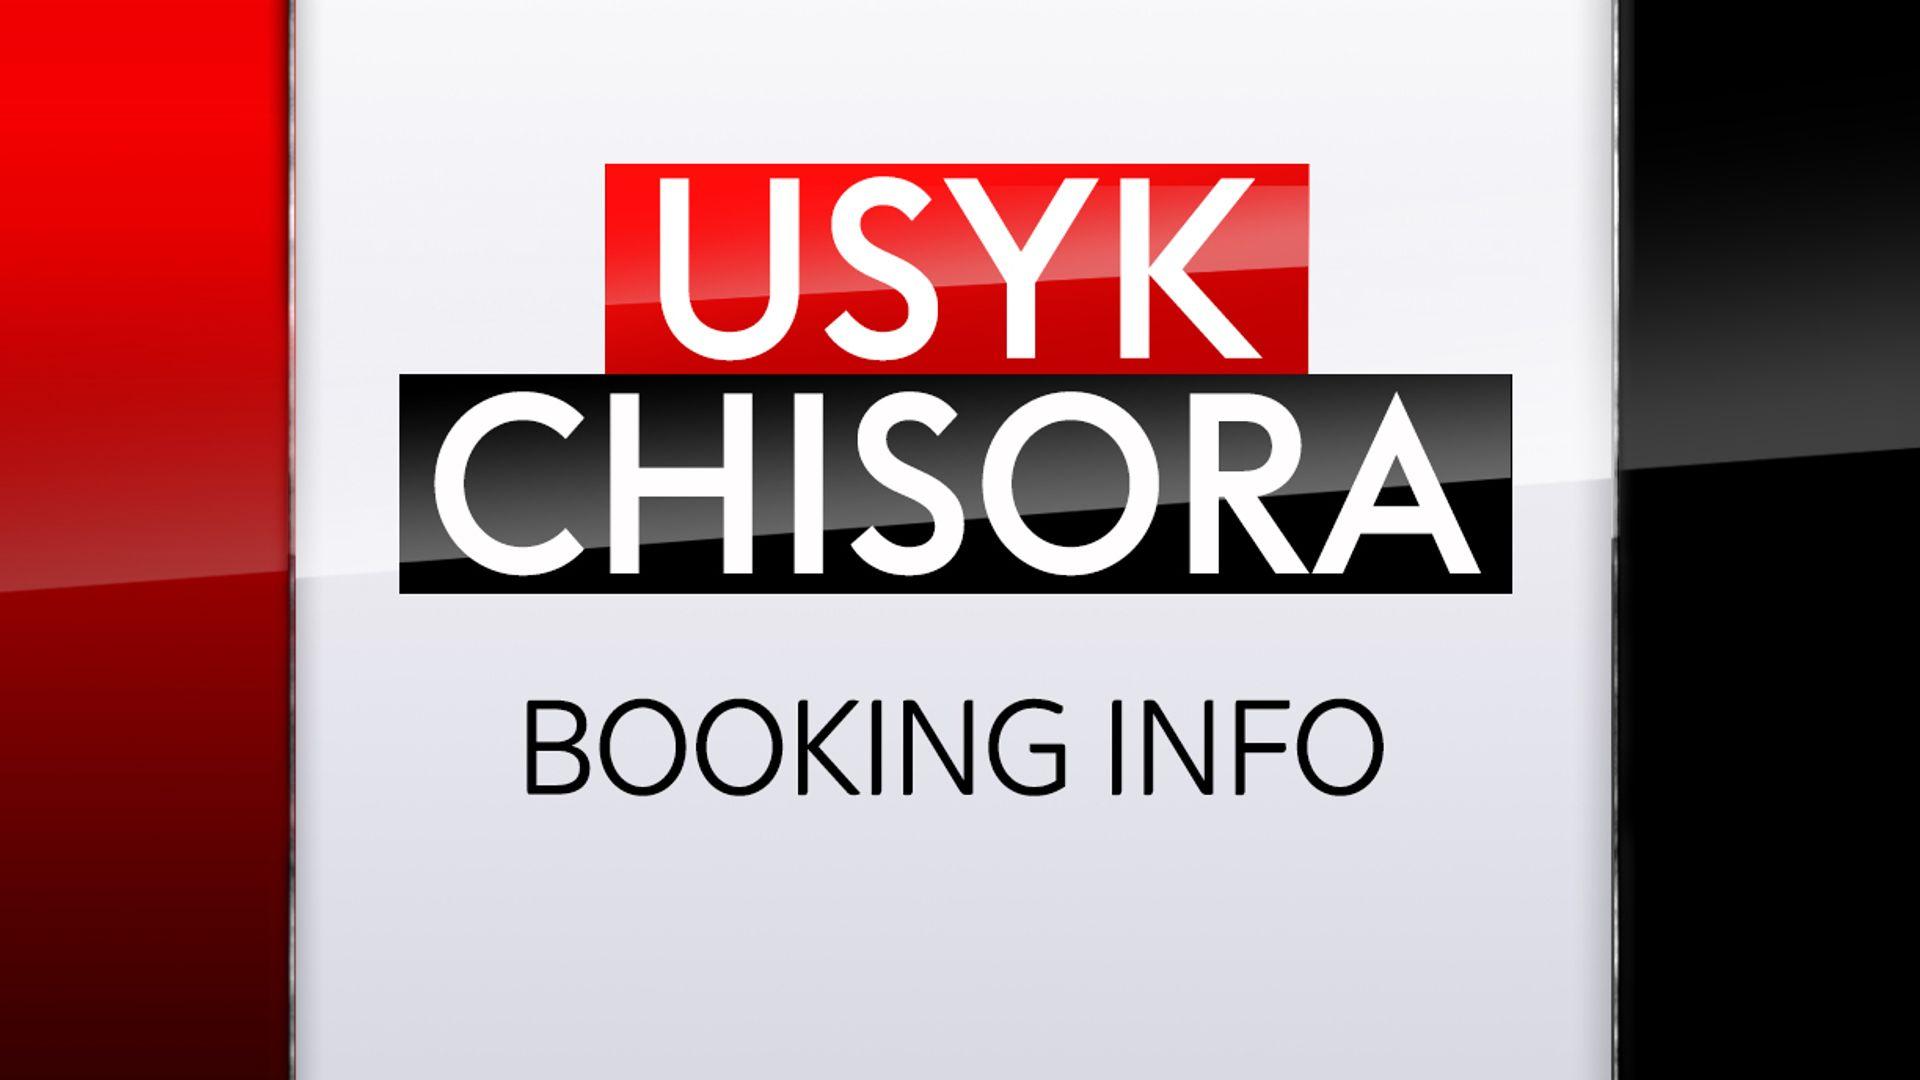 Usyk vs Chisora: Booking info